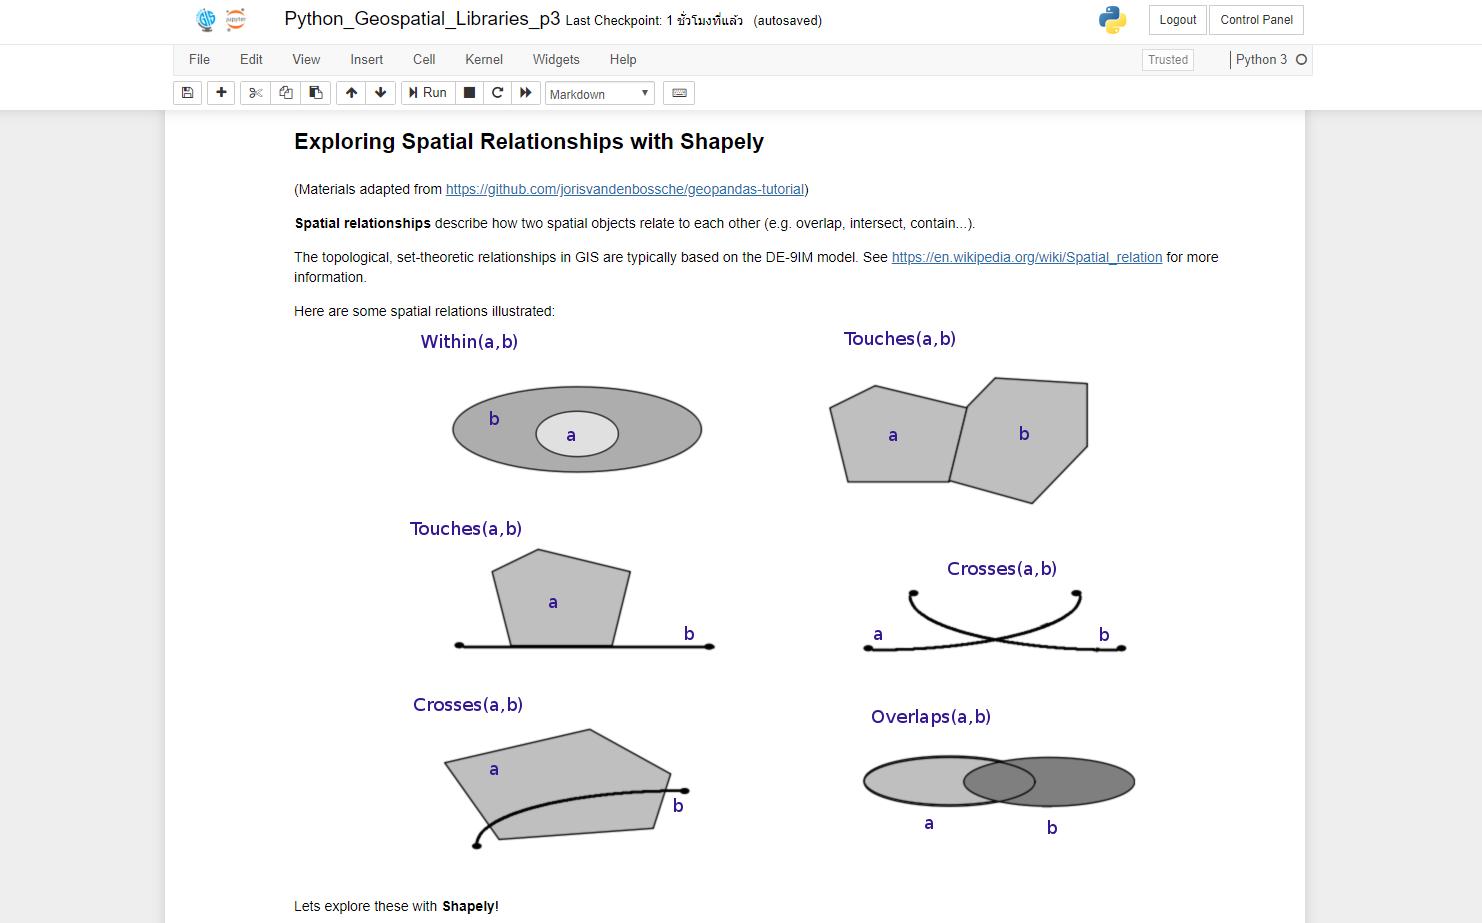 Python Geospatial Libraries